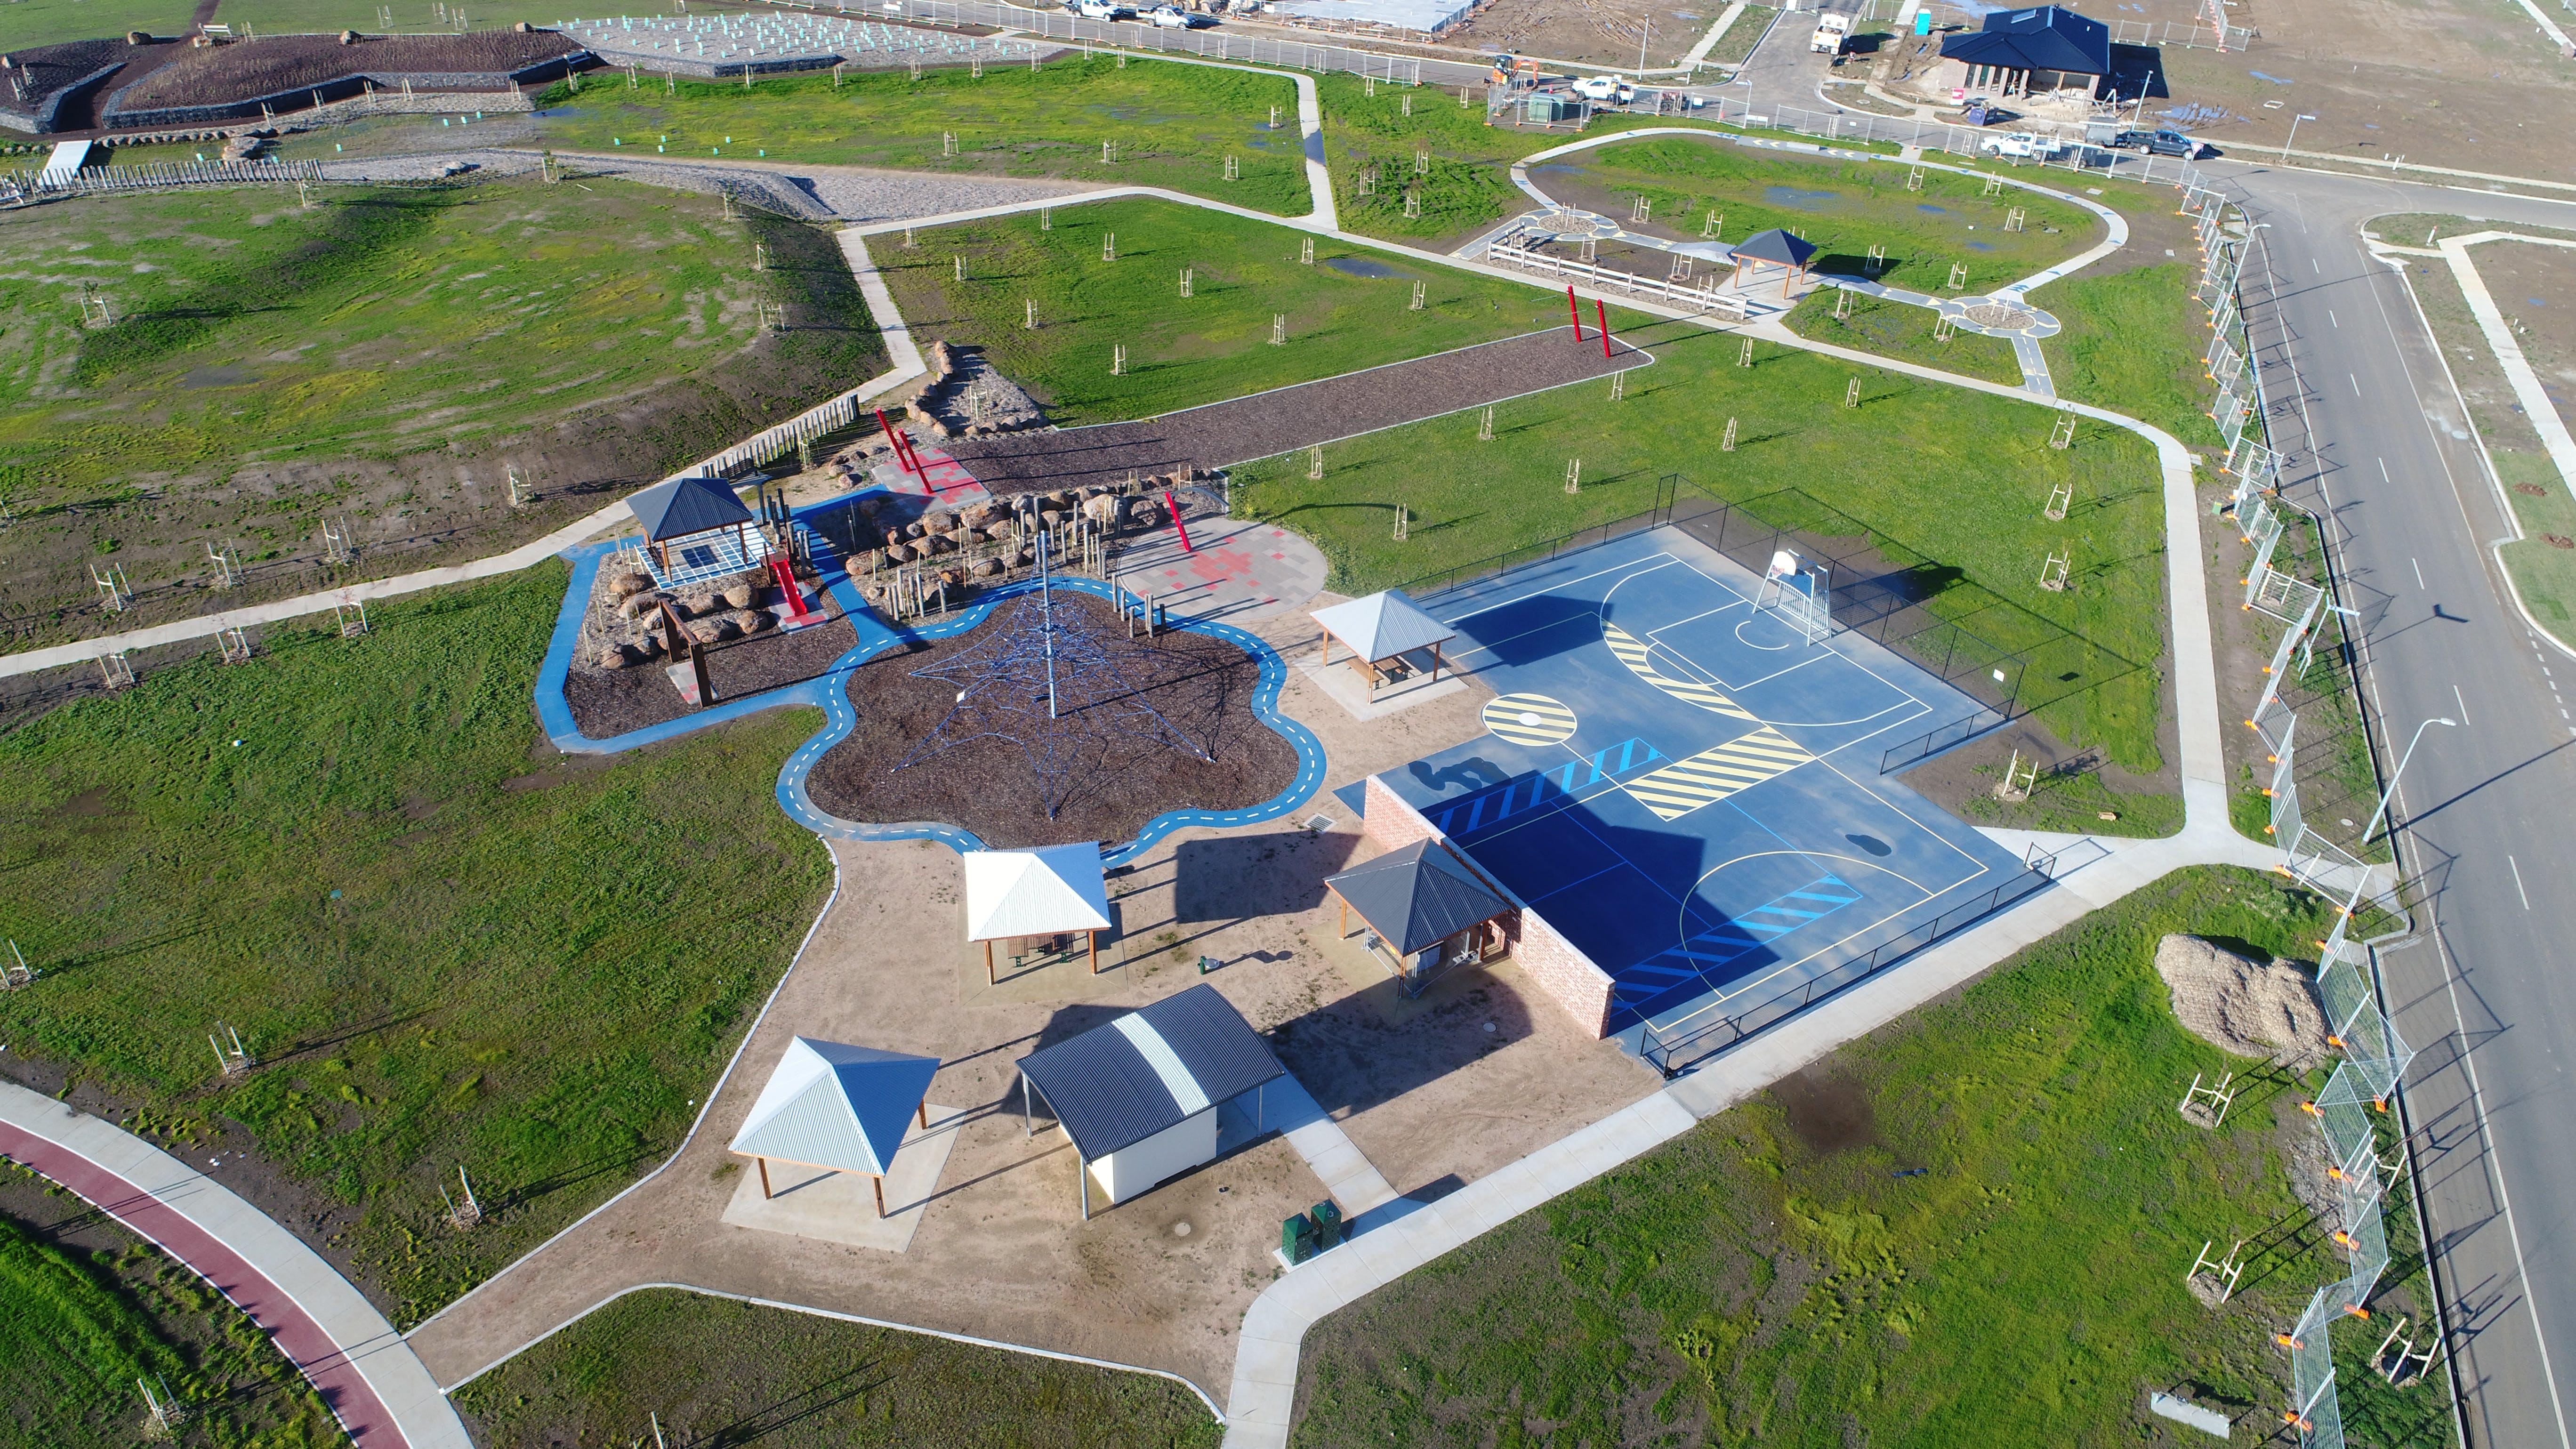 The newly created park at Ballymanus Estate